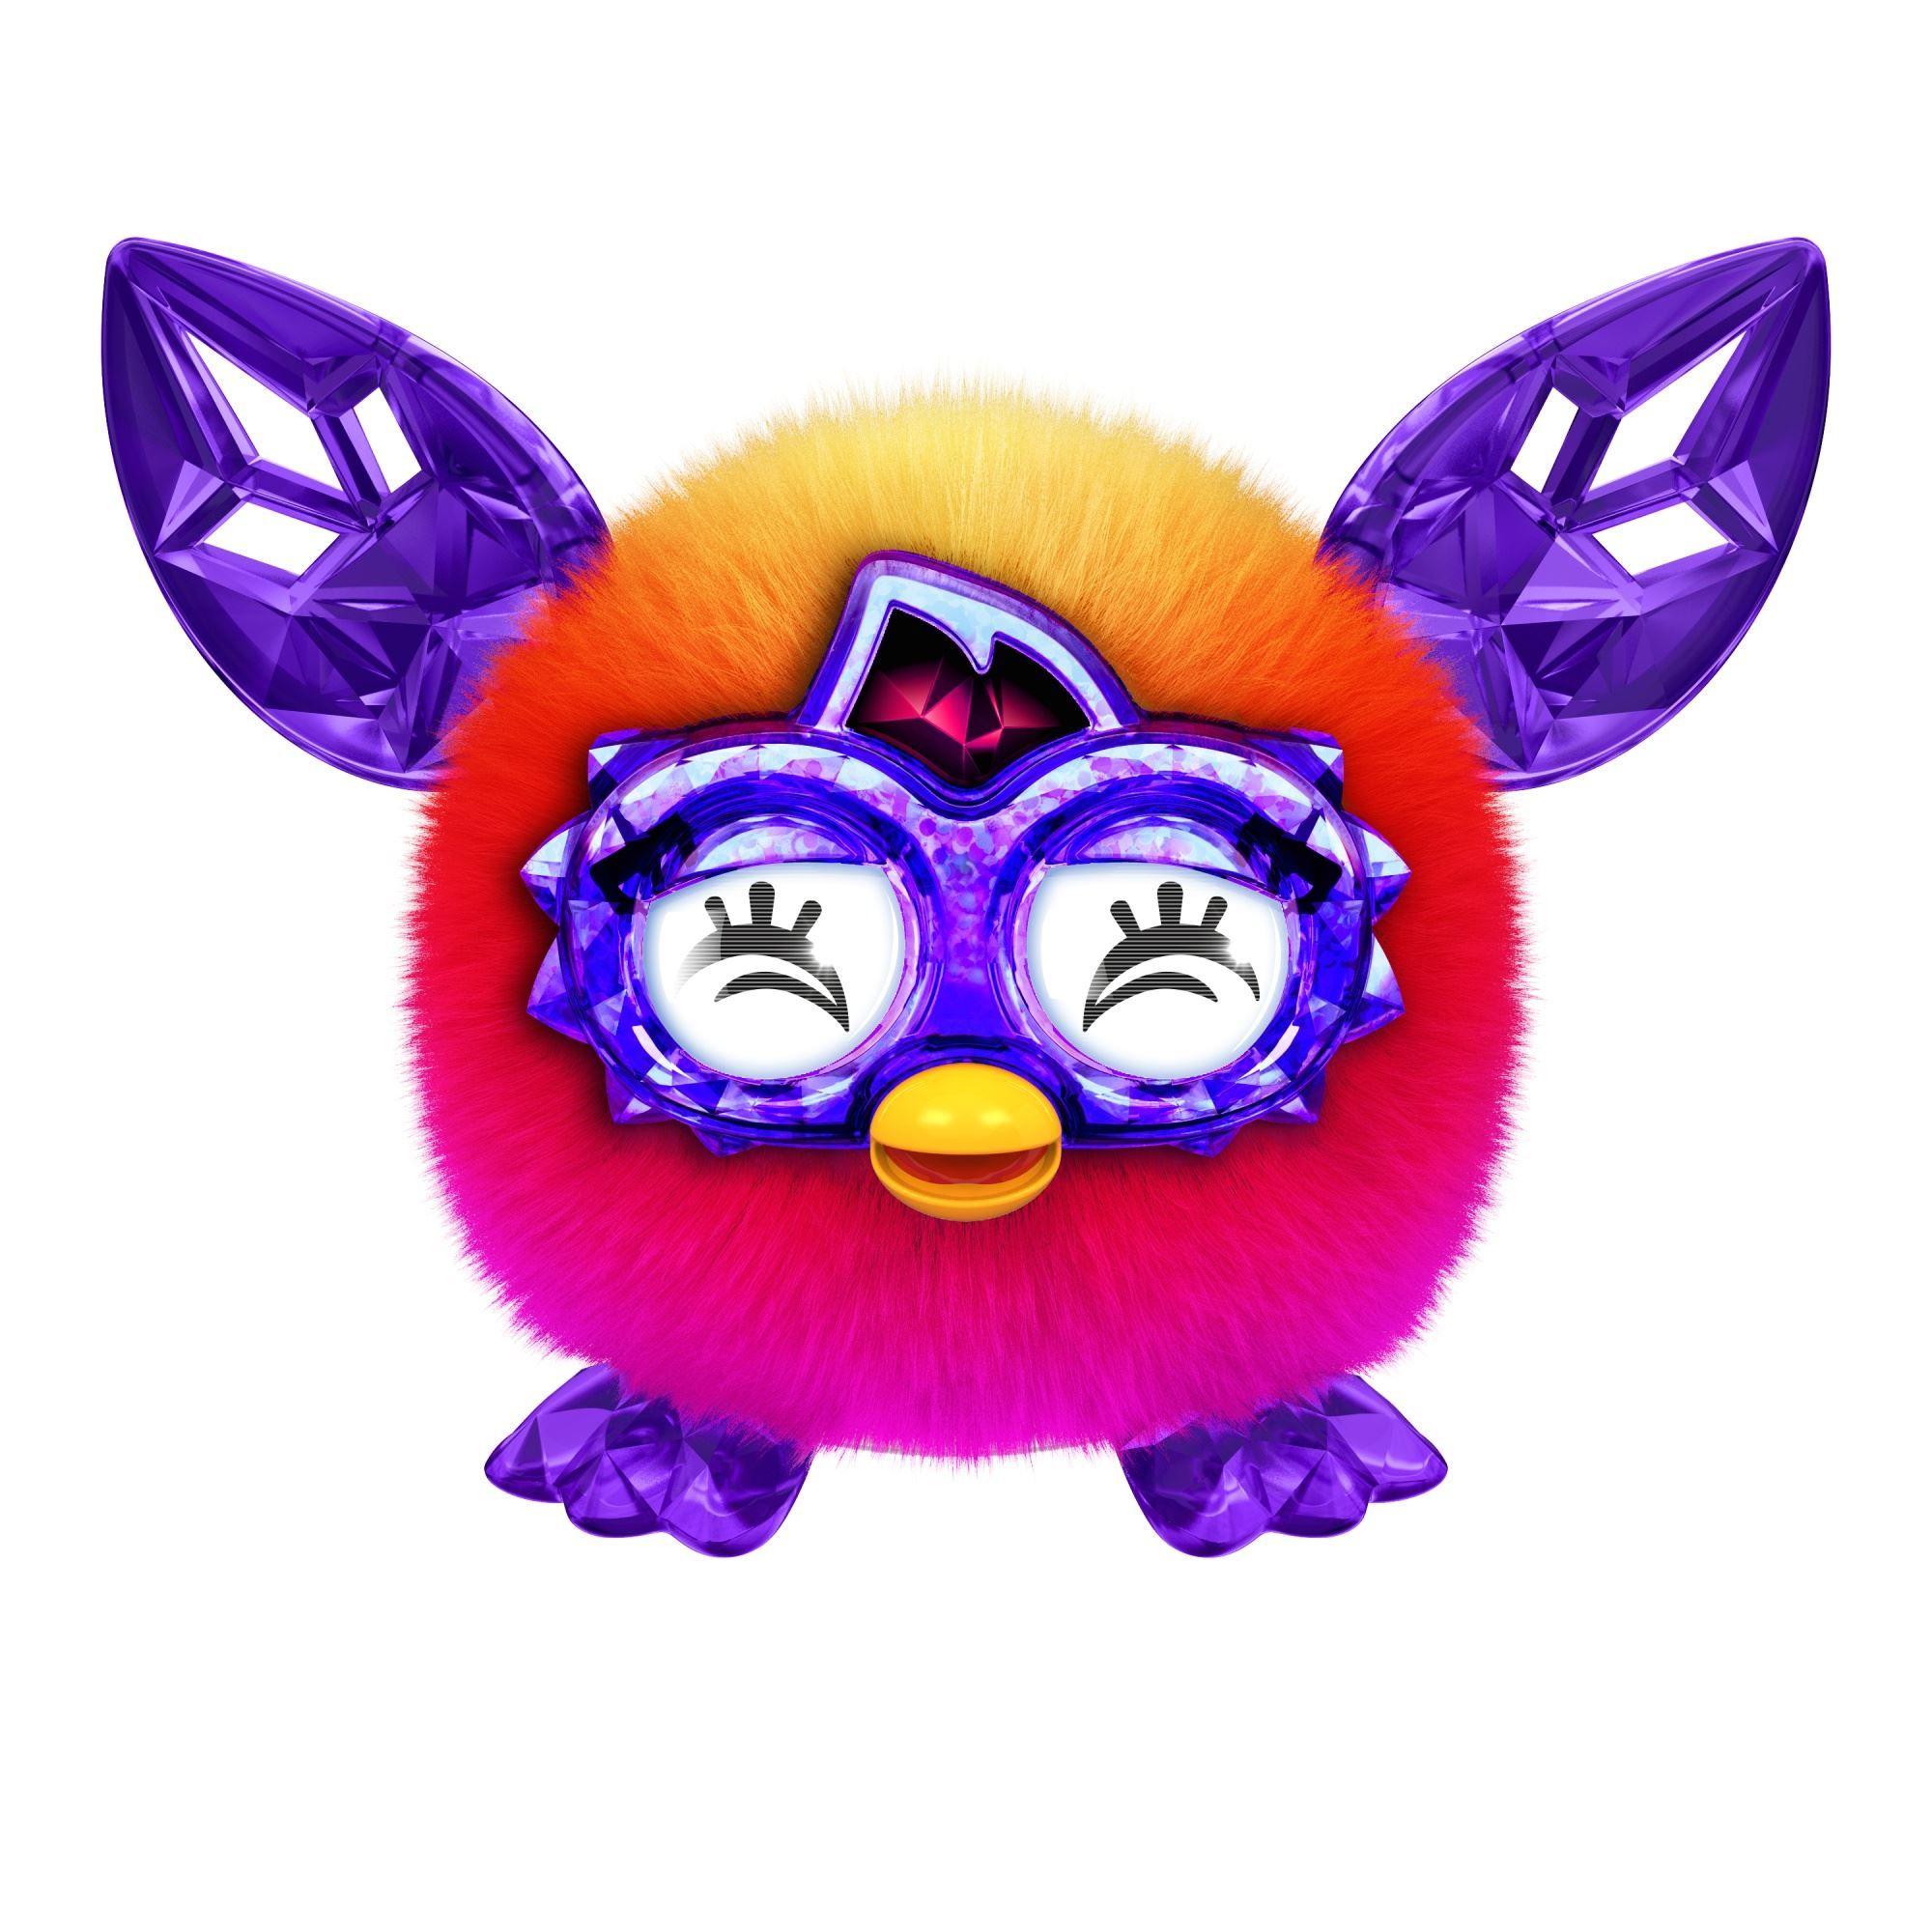 Furbys For Sale Online Furby Furby Connect Furby Boom